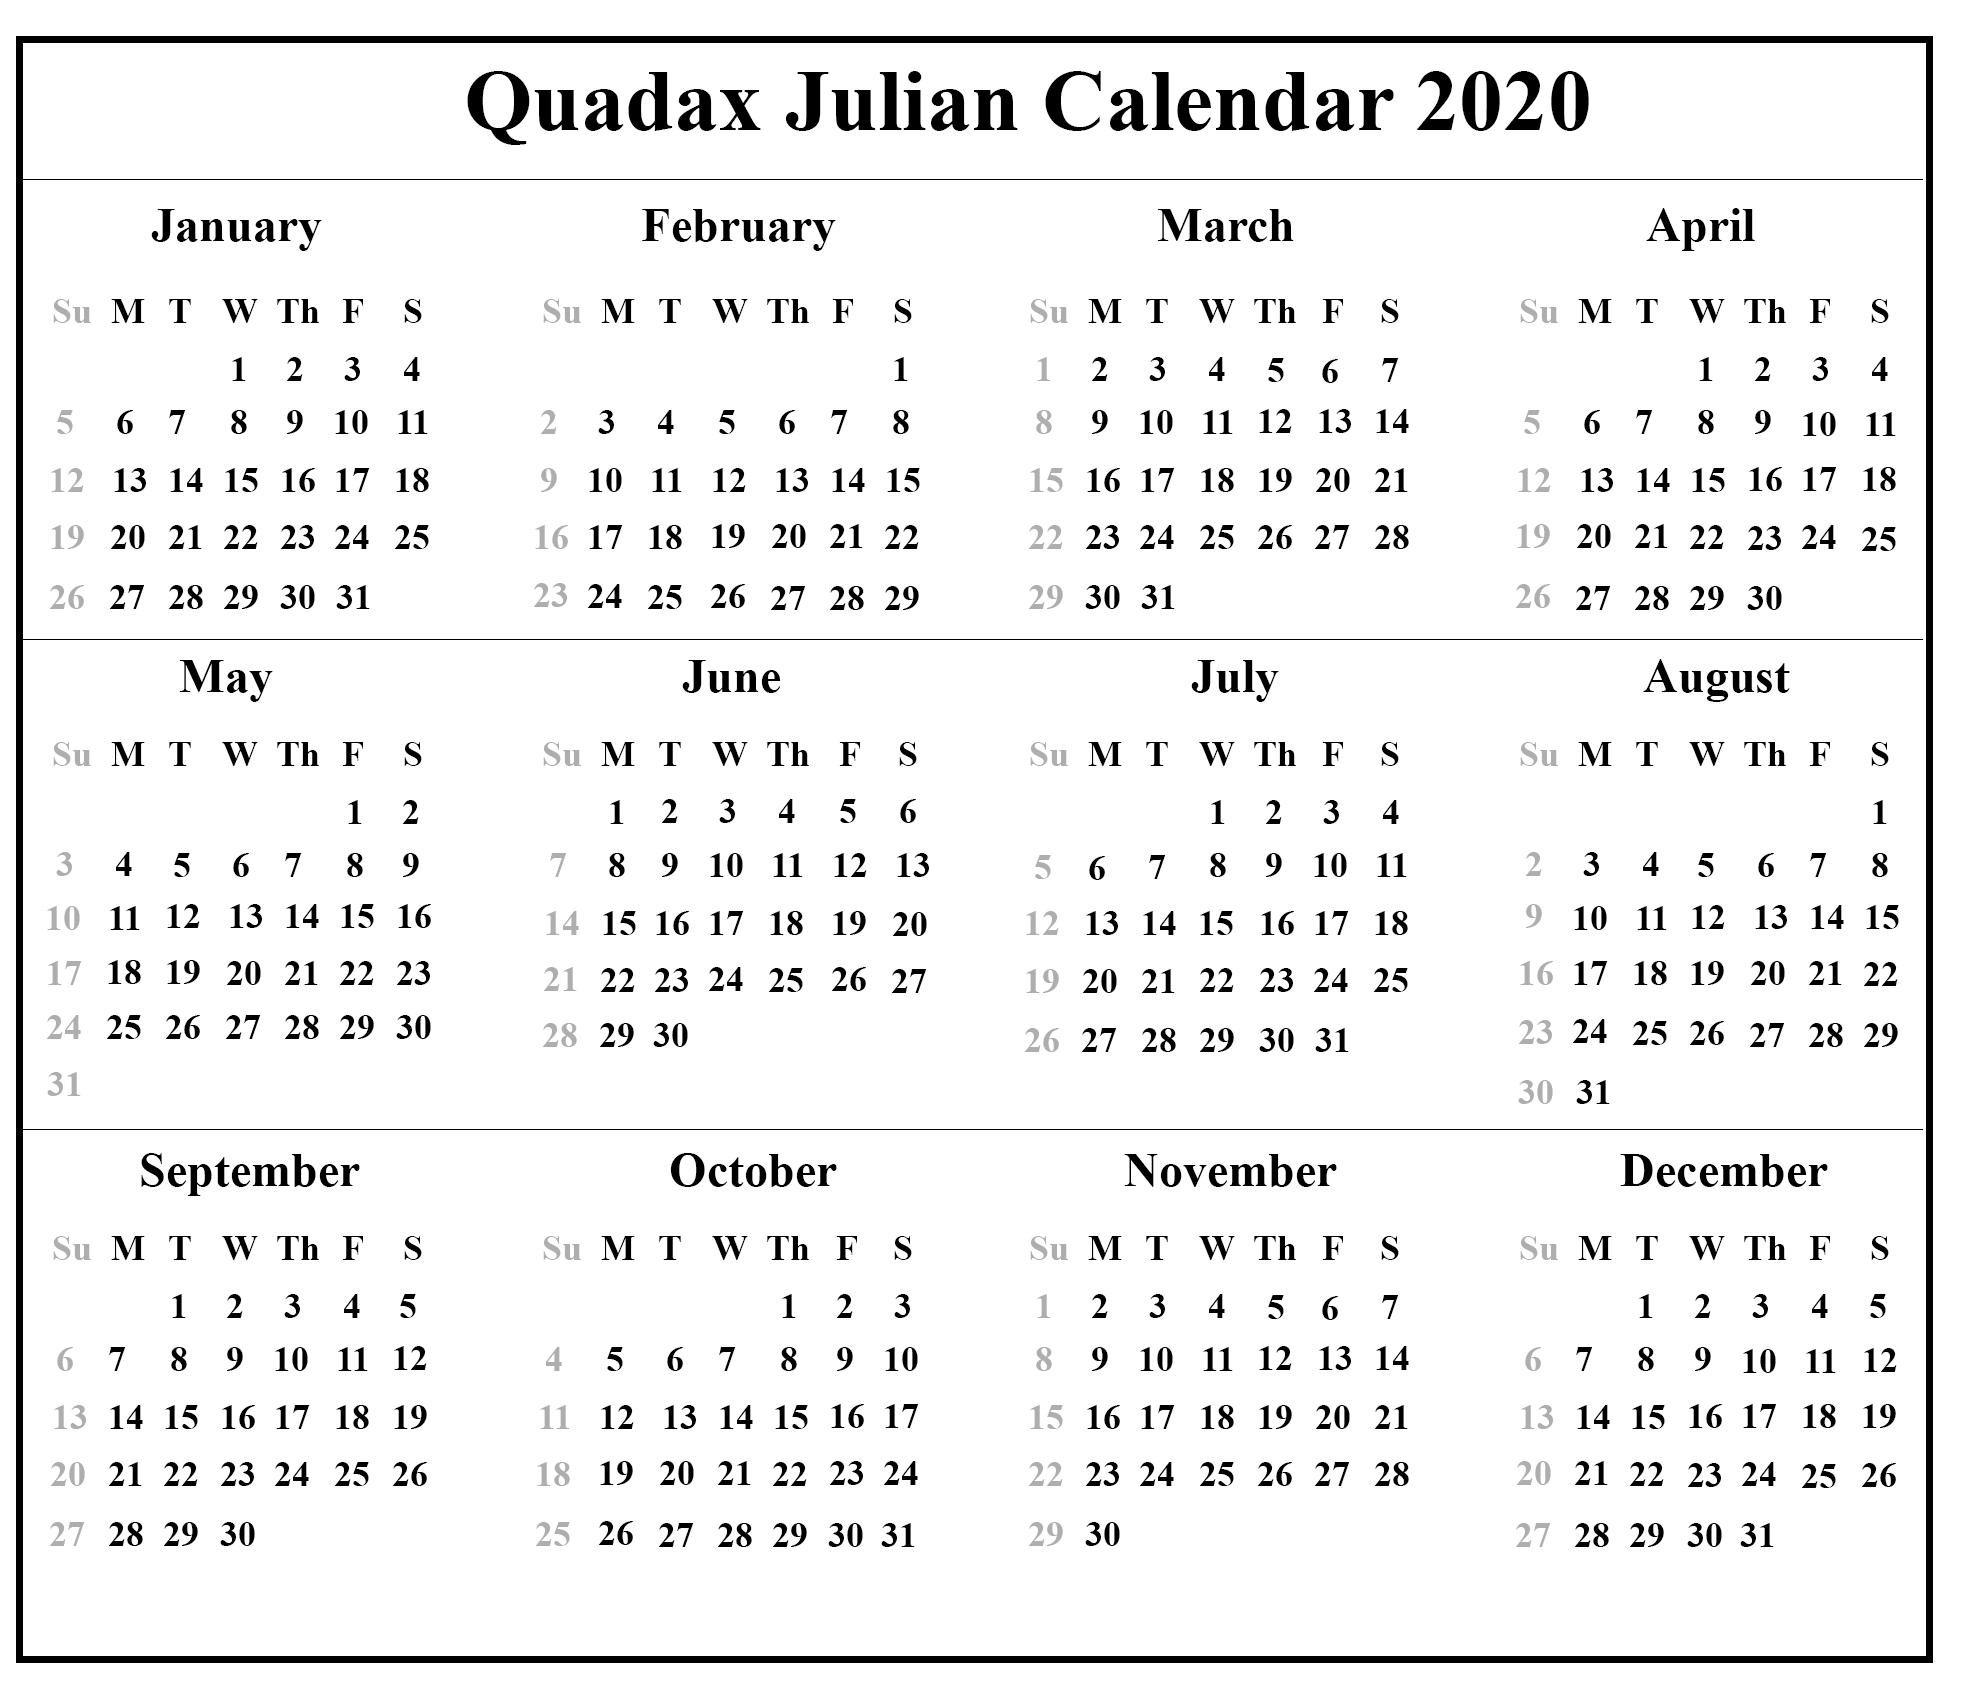 Quadax Julian Calendar 2020 Pdf | Example Calendar Printable